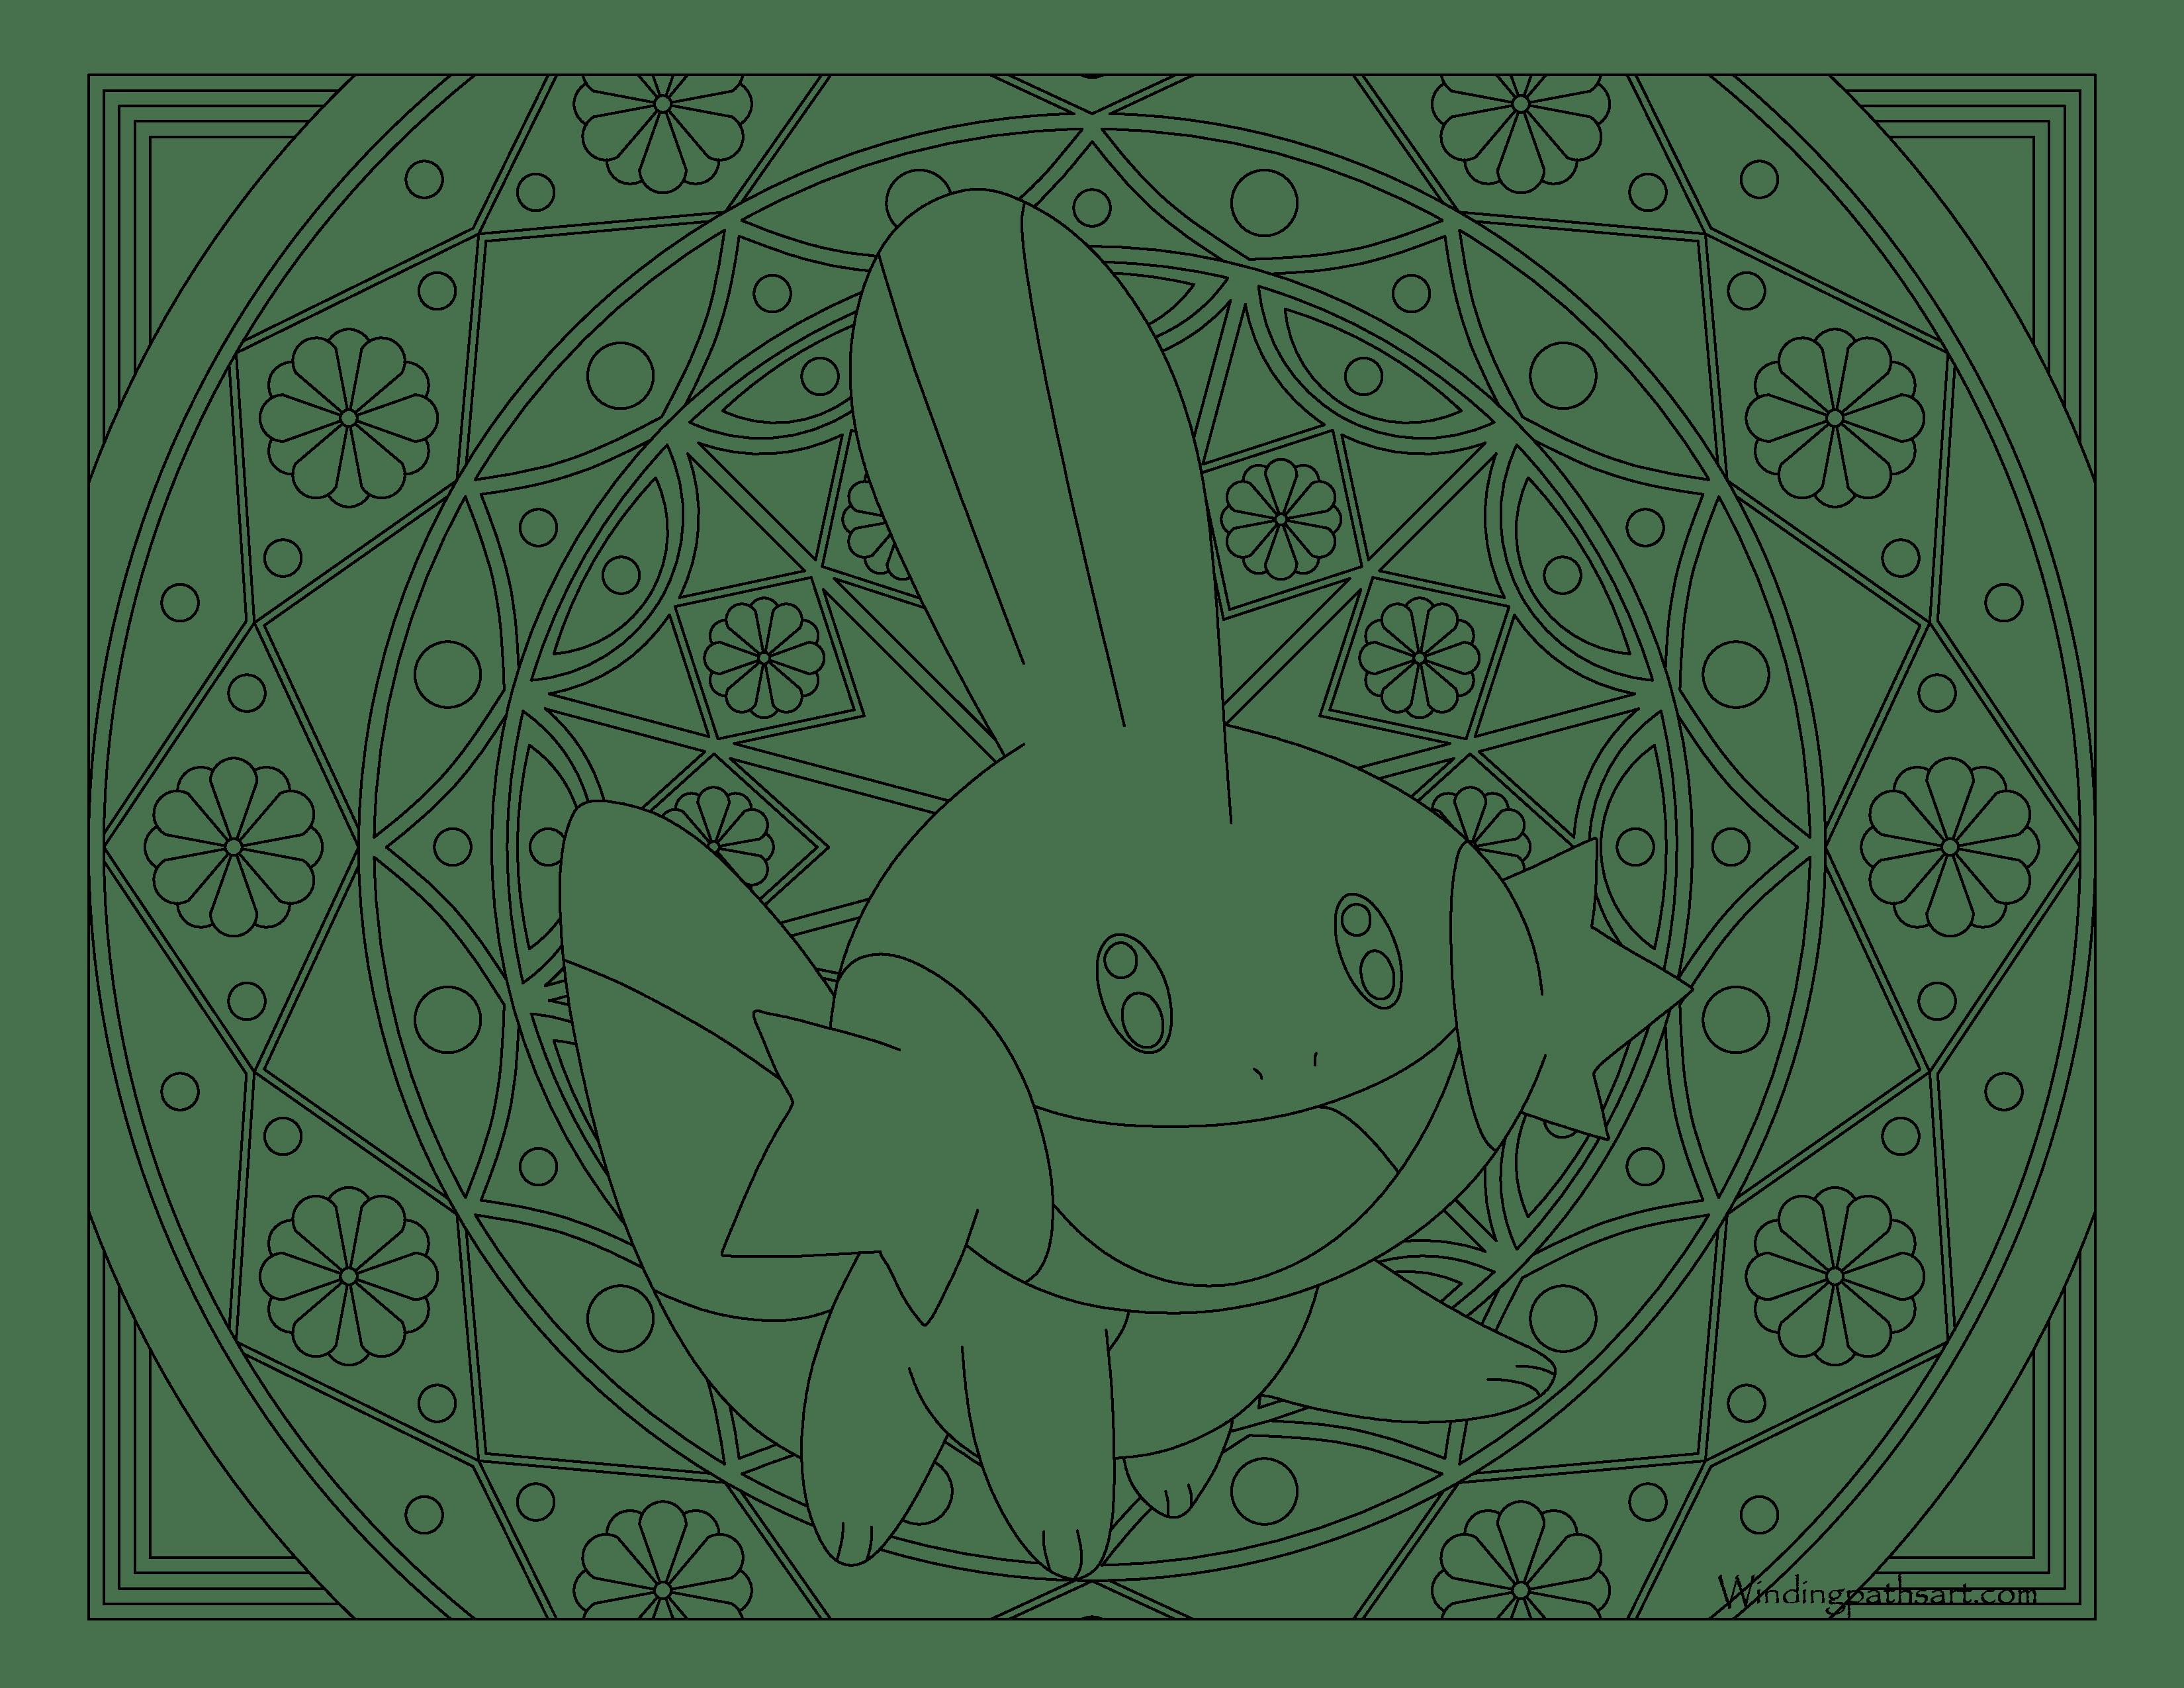 3300x2550 Mudkip Pokemon Coloring Page